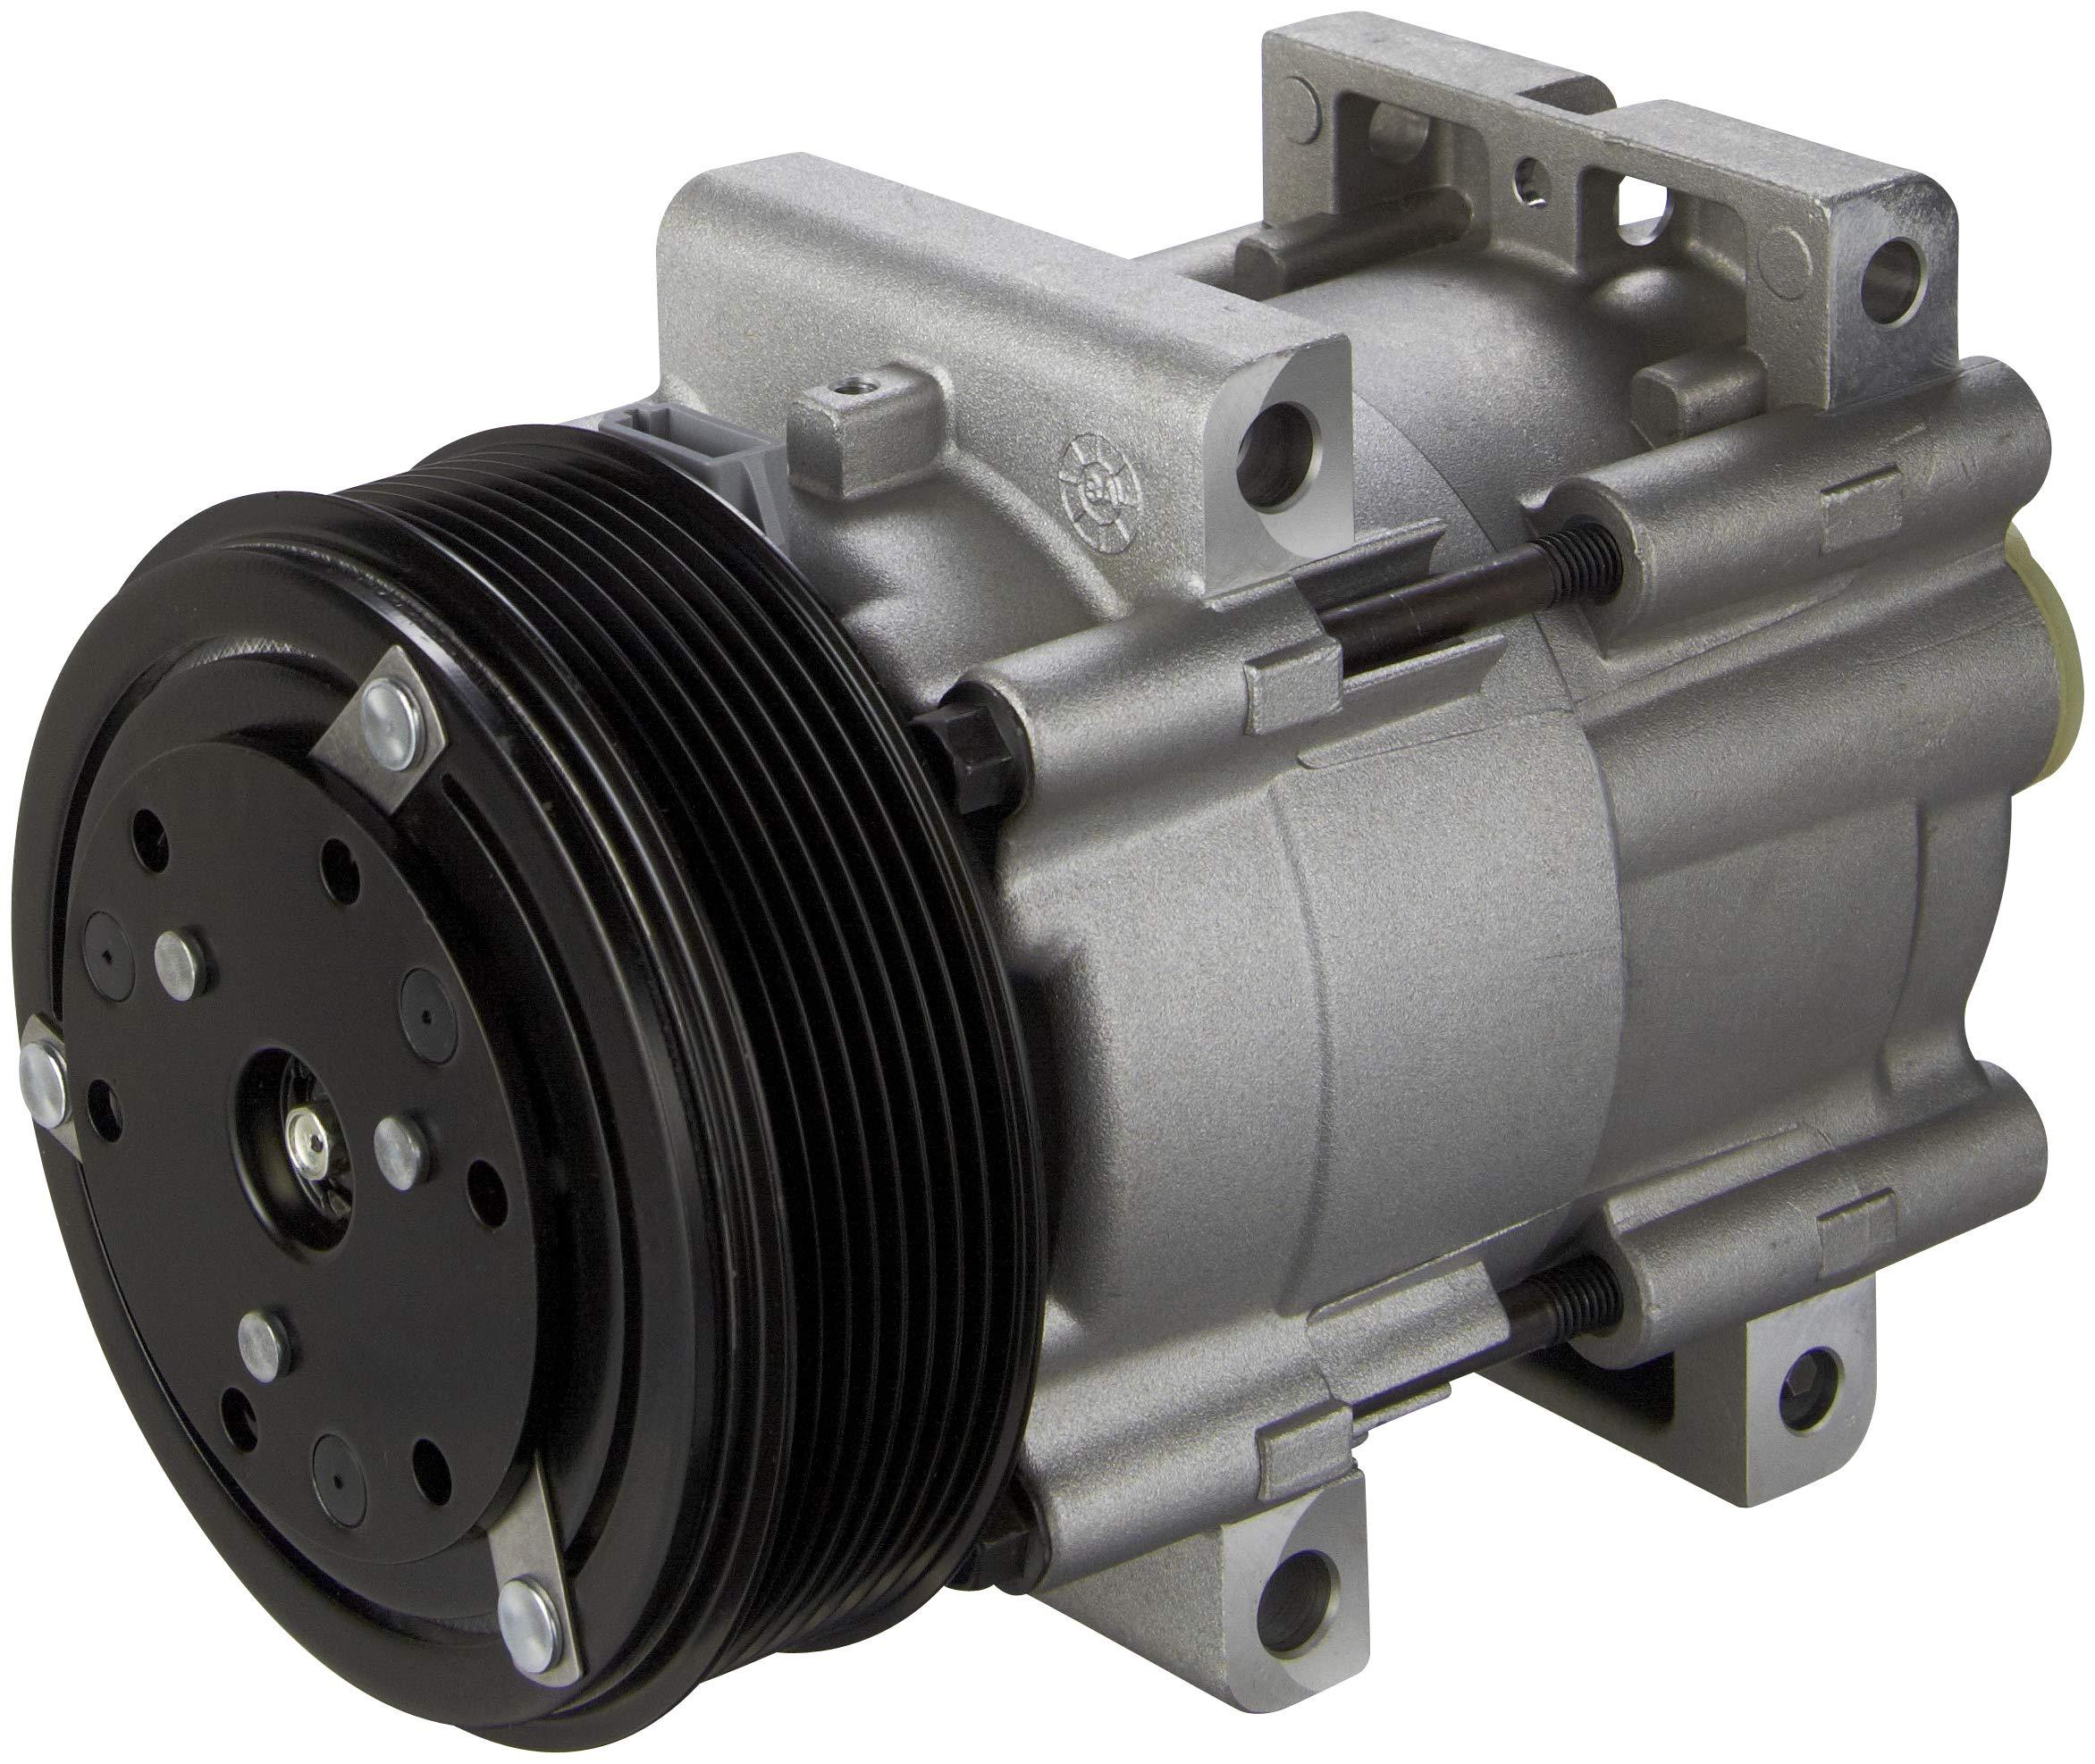 Spectra Premium 0658161 A/C Compressor